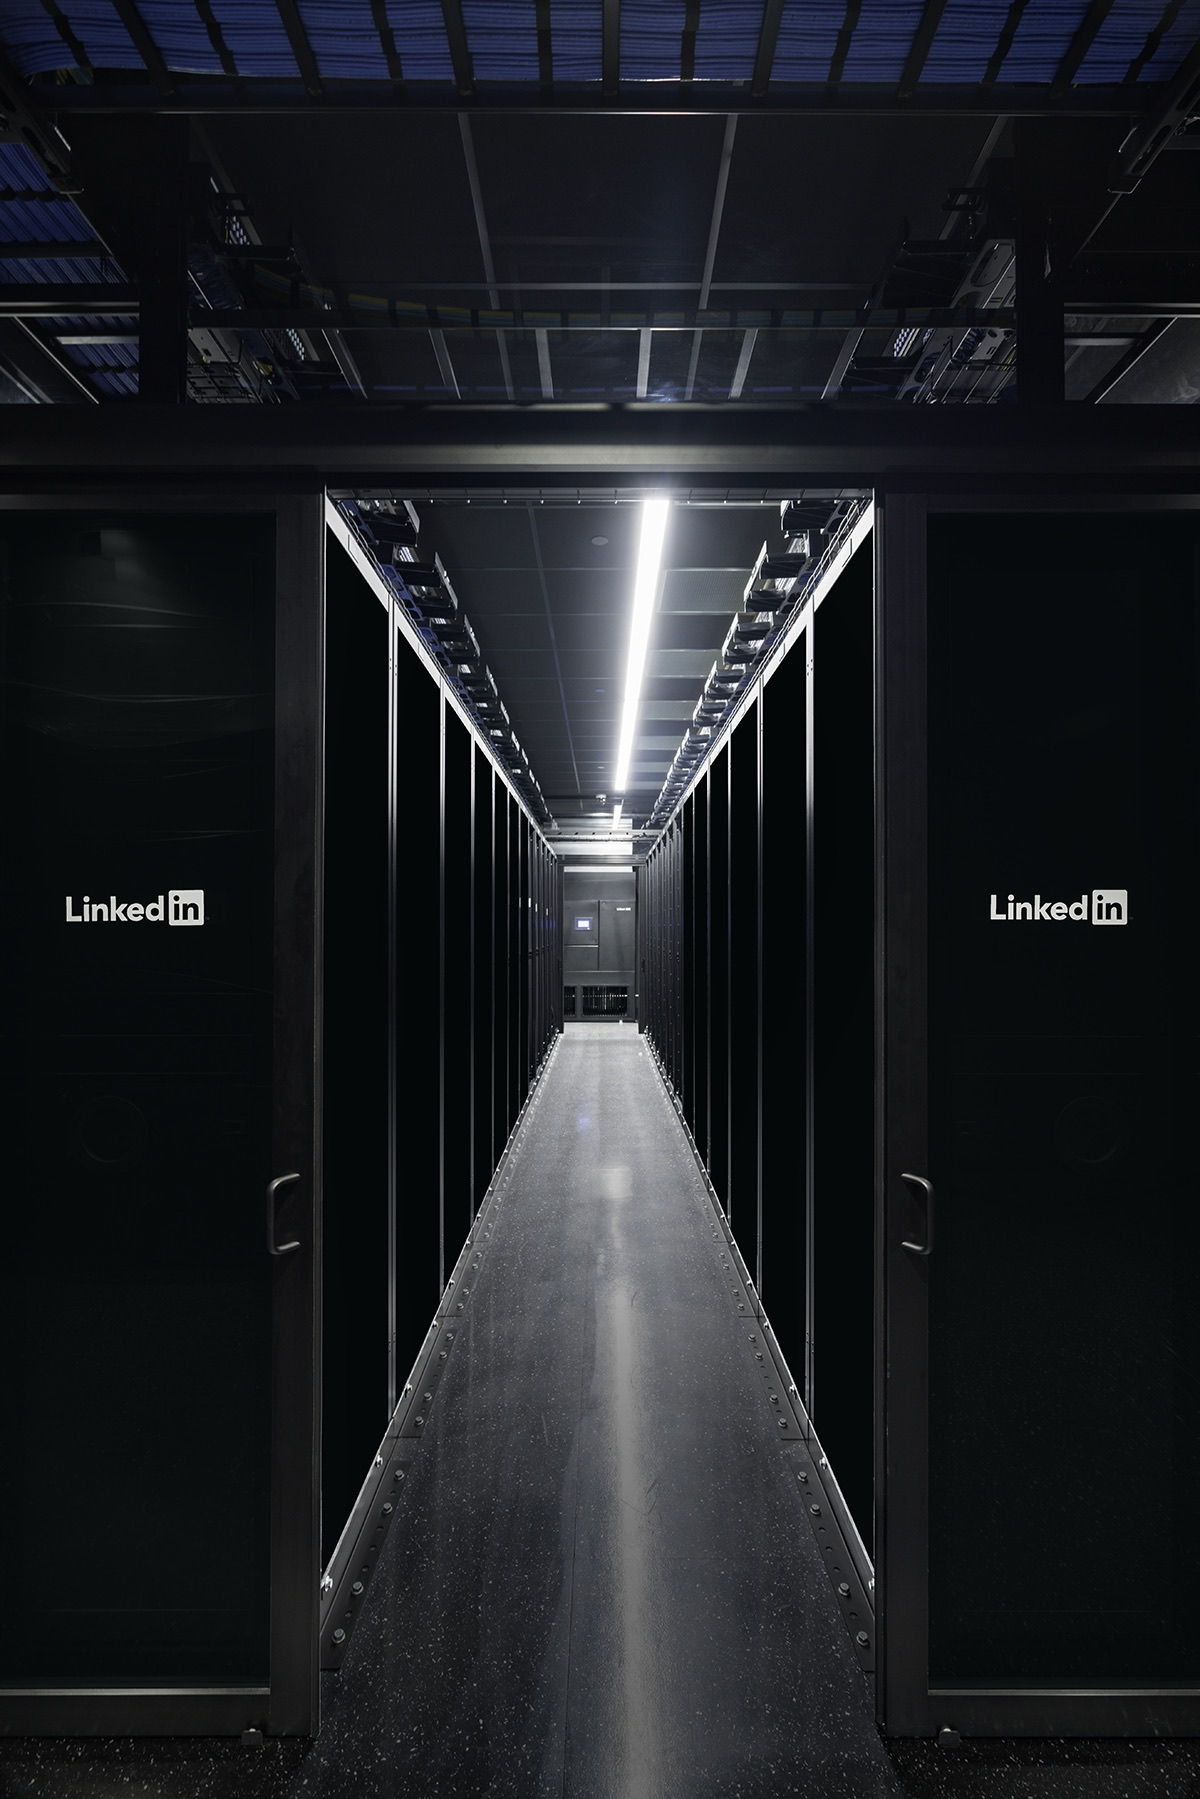 linkedin-sunnyvale-office-9